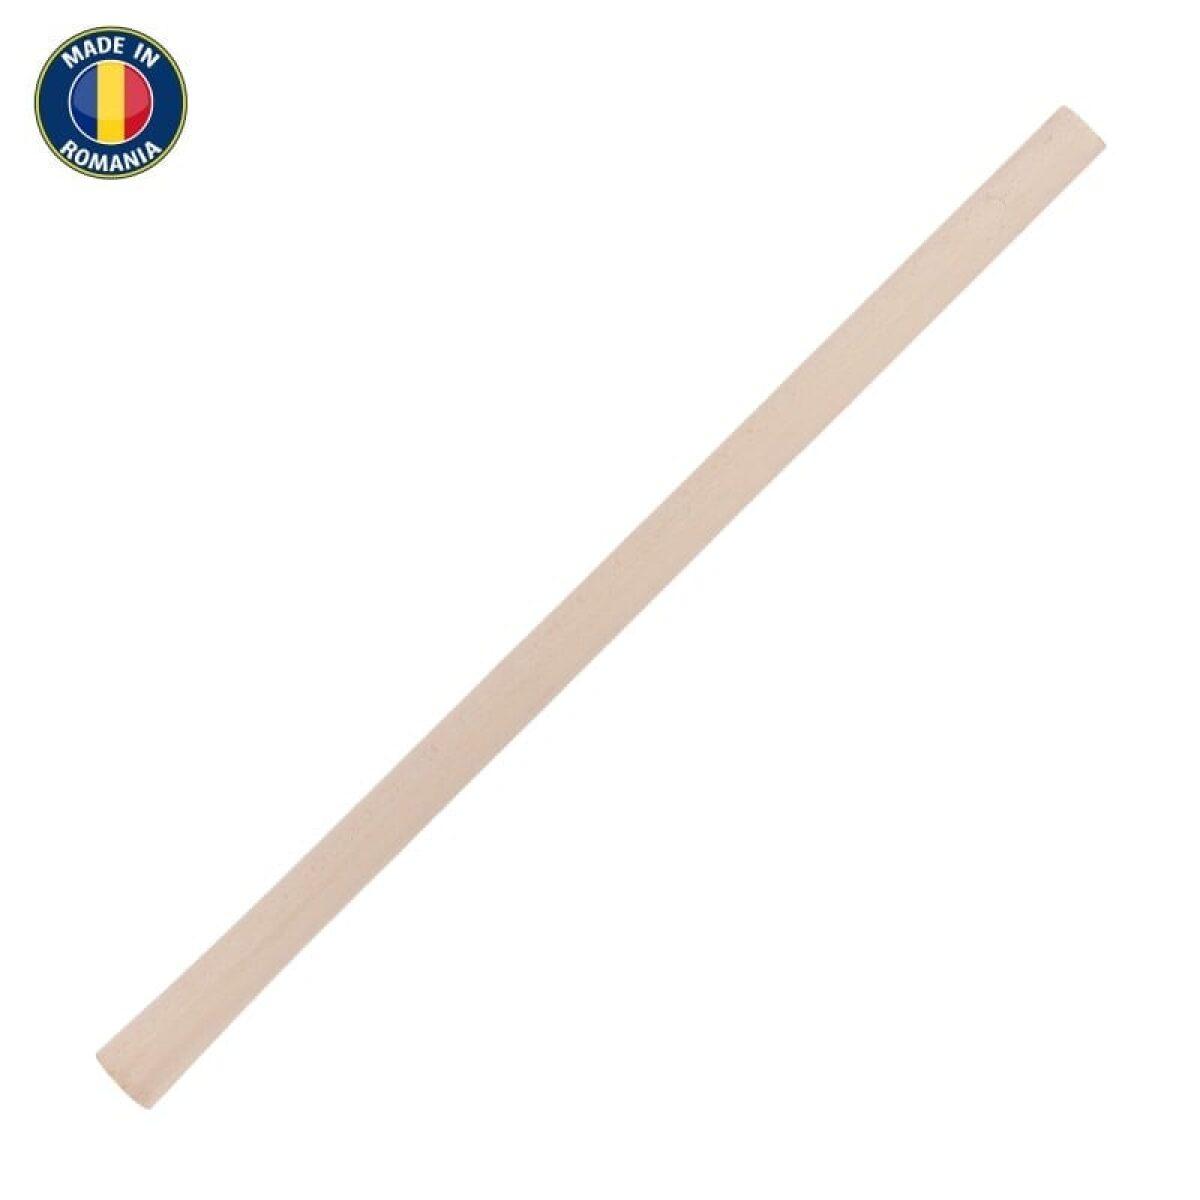 coada lemn pentru tarnacop s padure gardina.ro 58